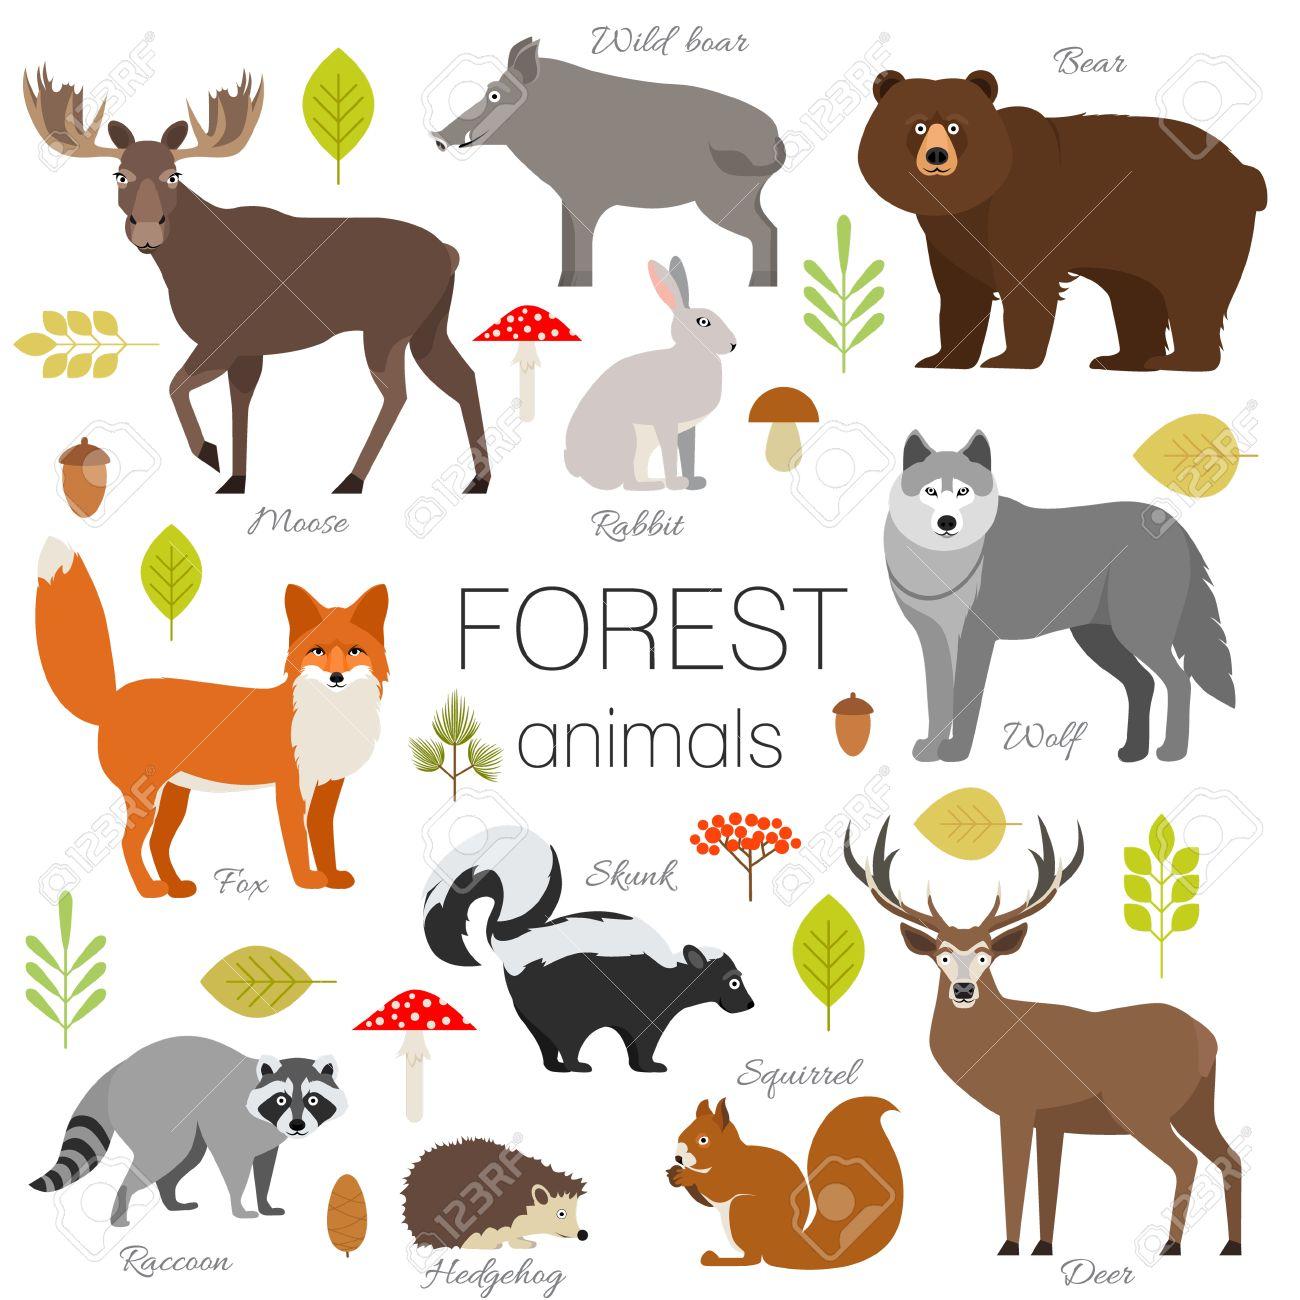 Set of forest animals isolated vector. Moose, wild boar, bear, fox, rabbit, wolf skunk raccoon deer squirrel hendgehog - 68501203